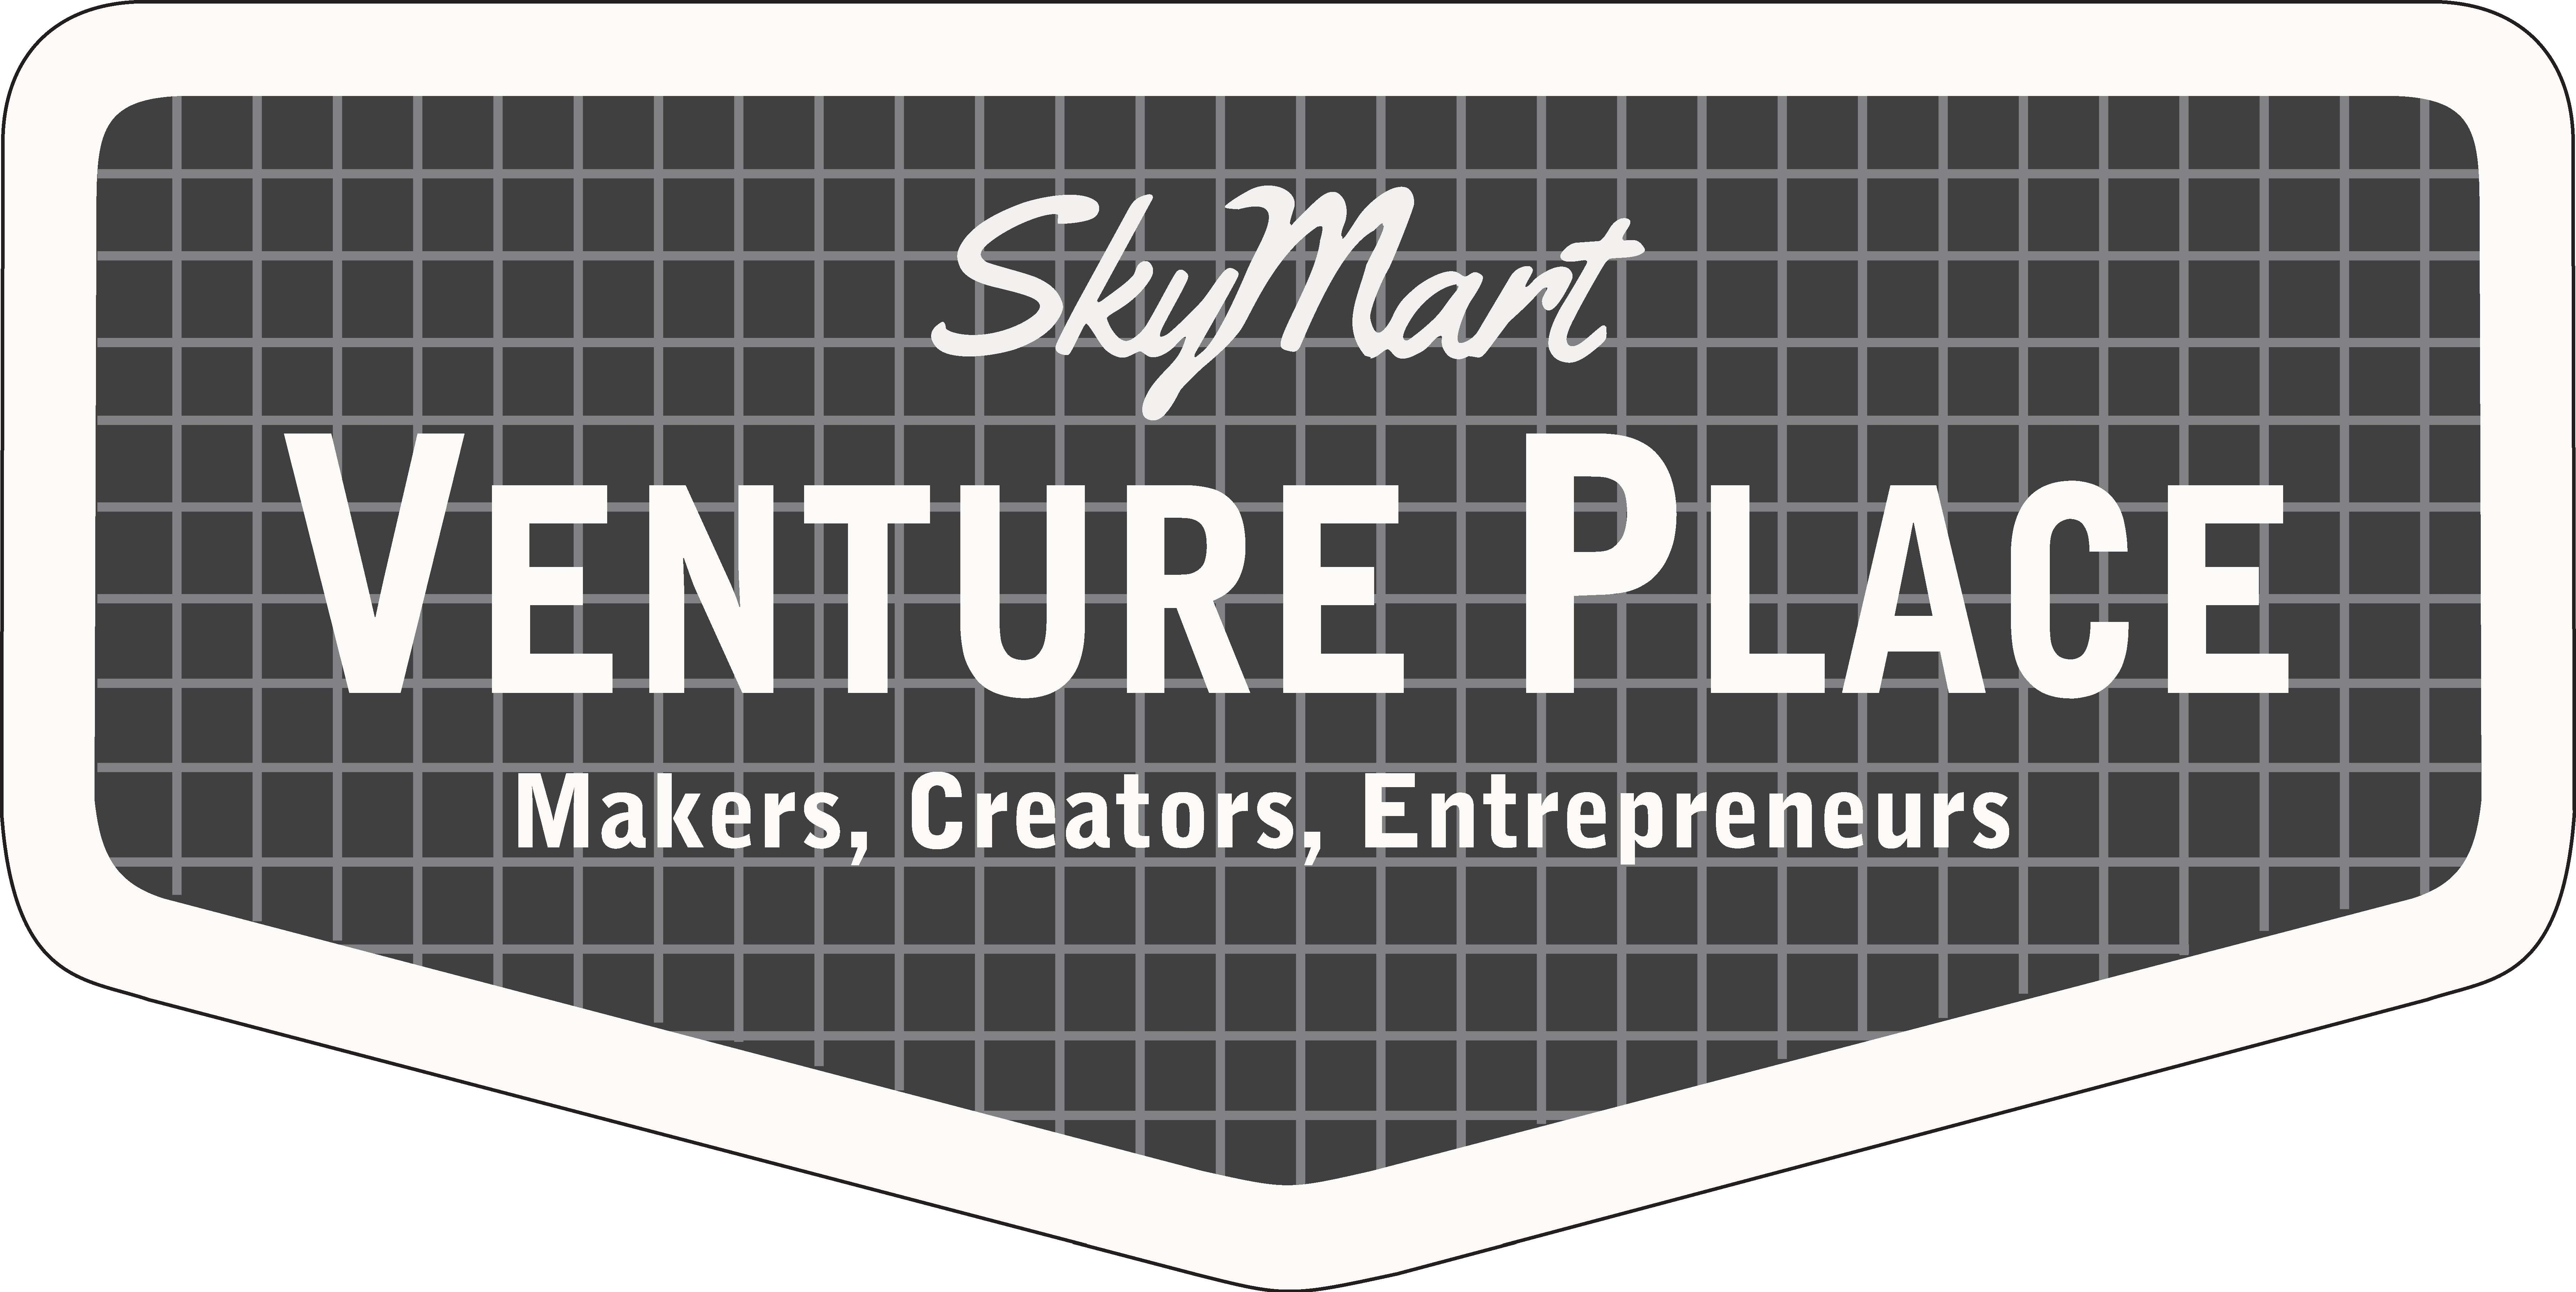 Skymart Venture Place